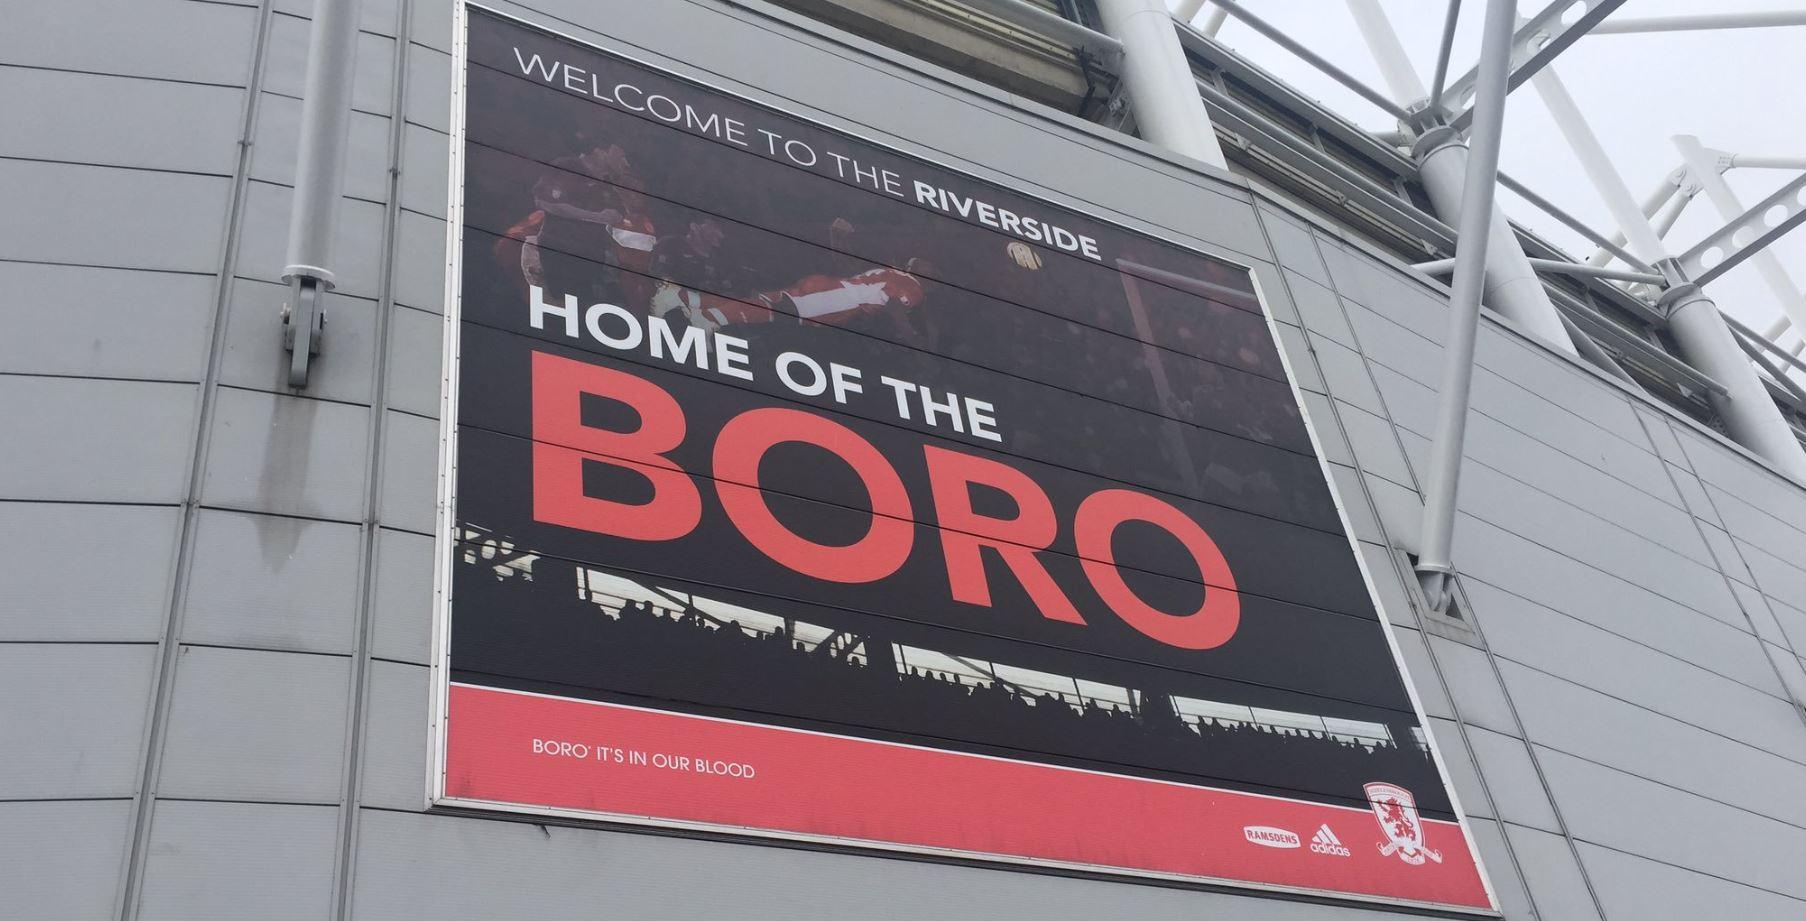 Middlesbrough Aston Villa Match preview